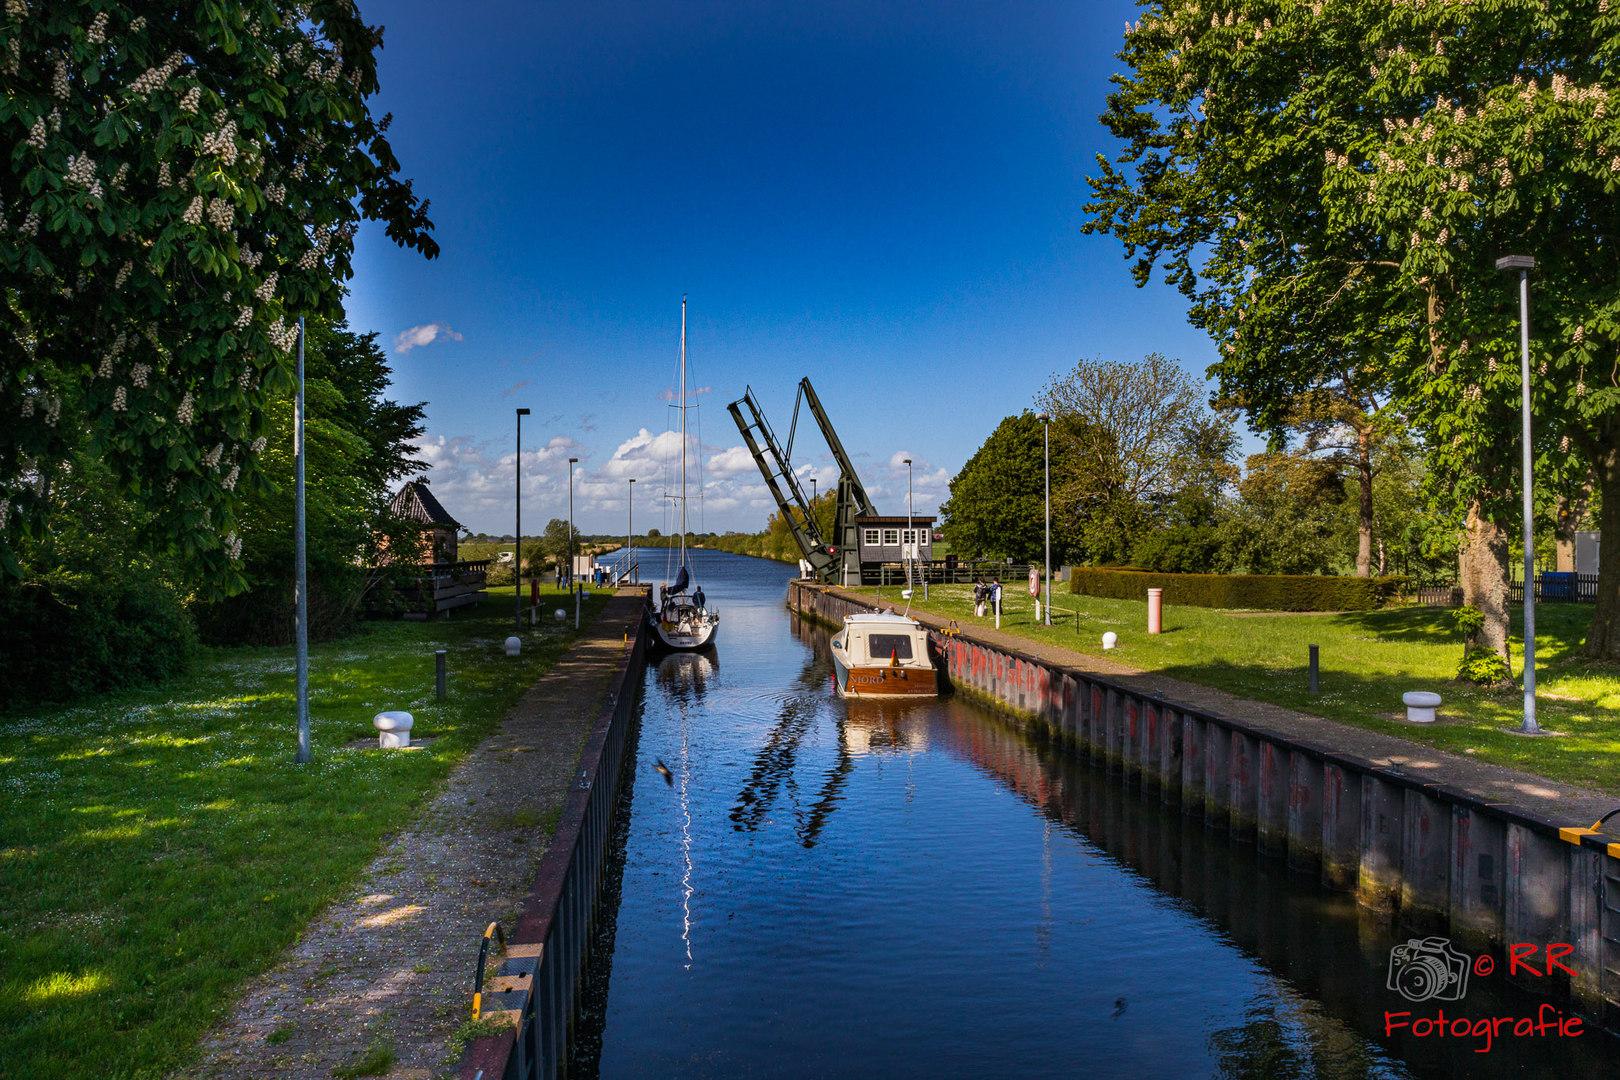 2020.05.24 Breiholz Kanal und Gieselausc